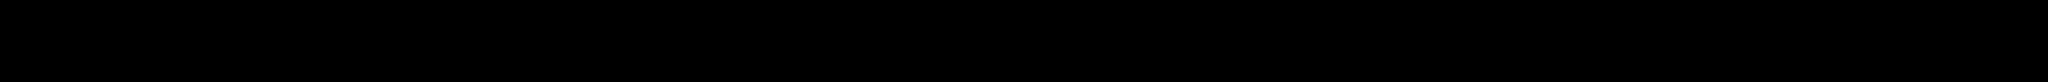 COMMA двигателно масло